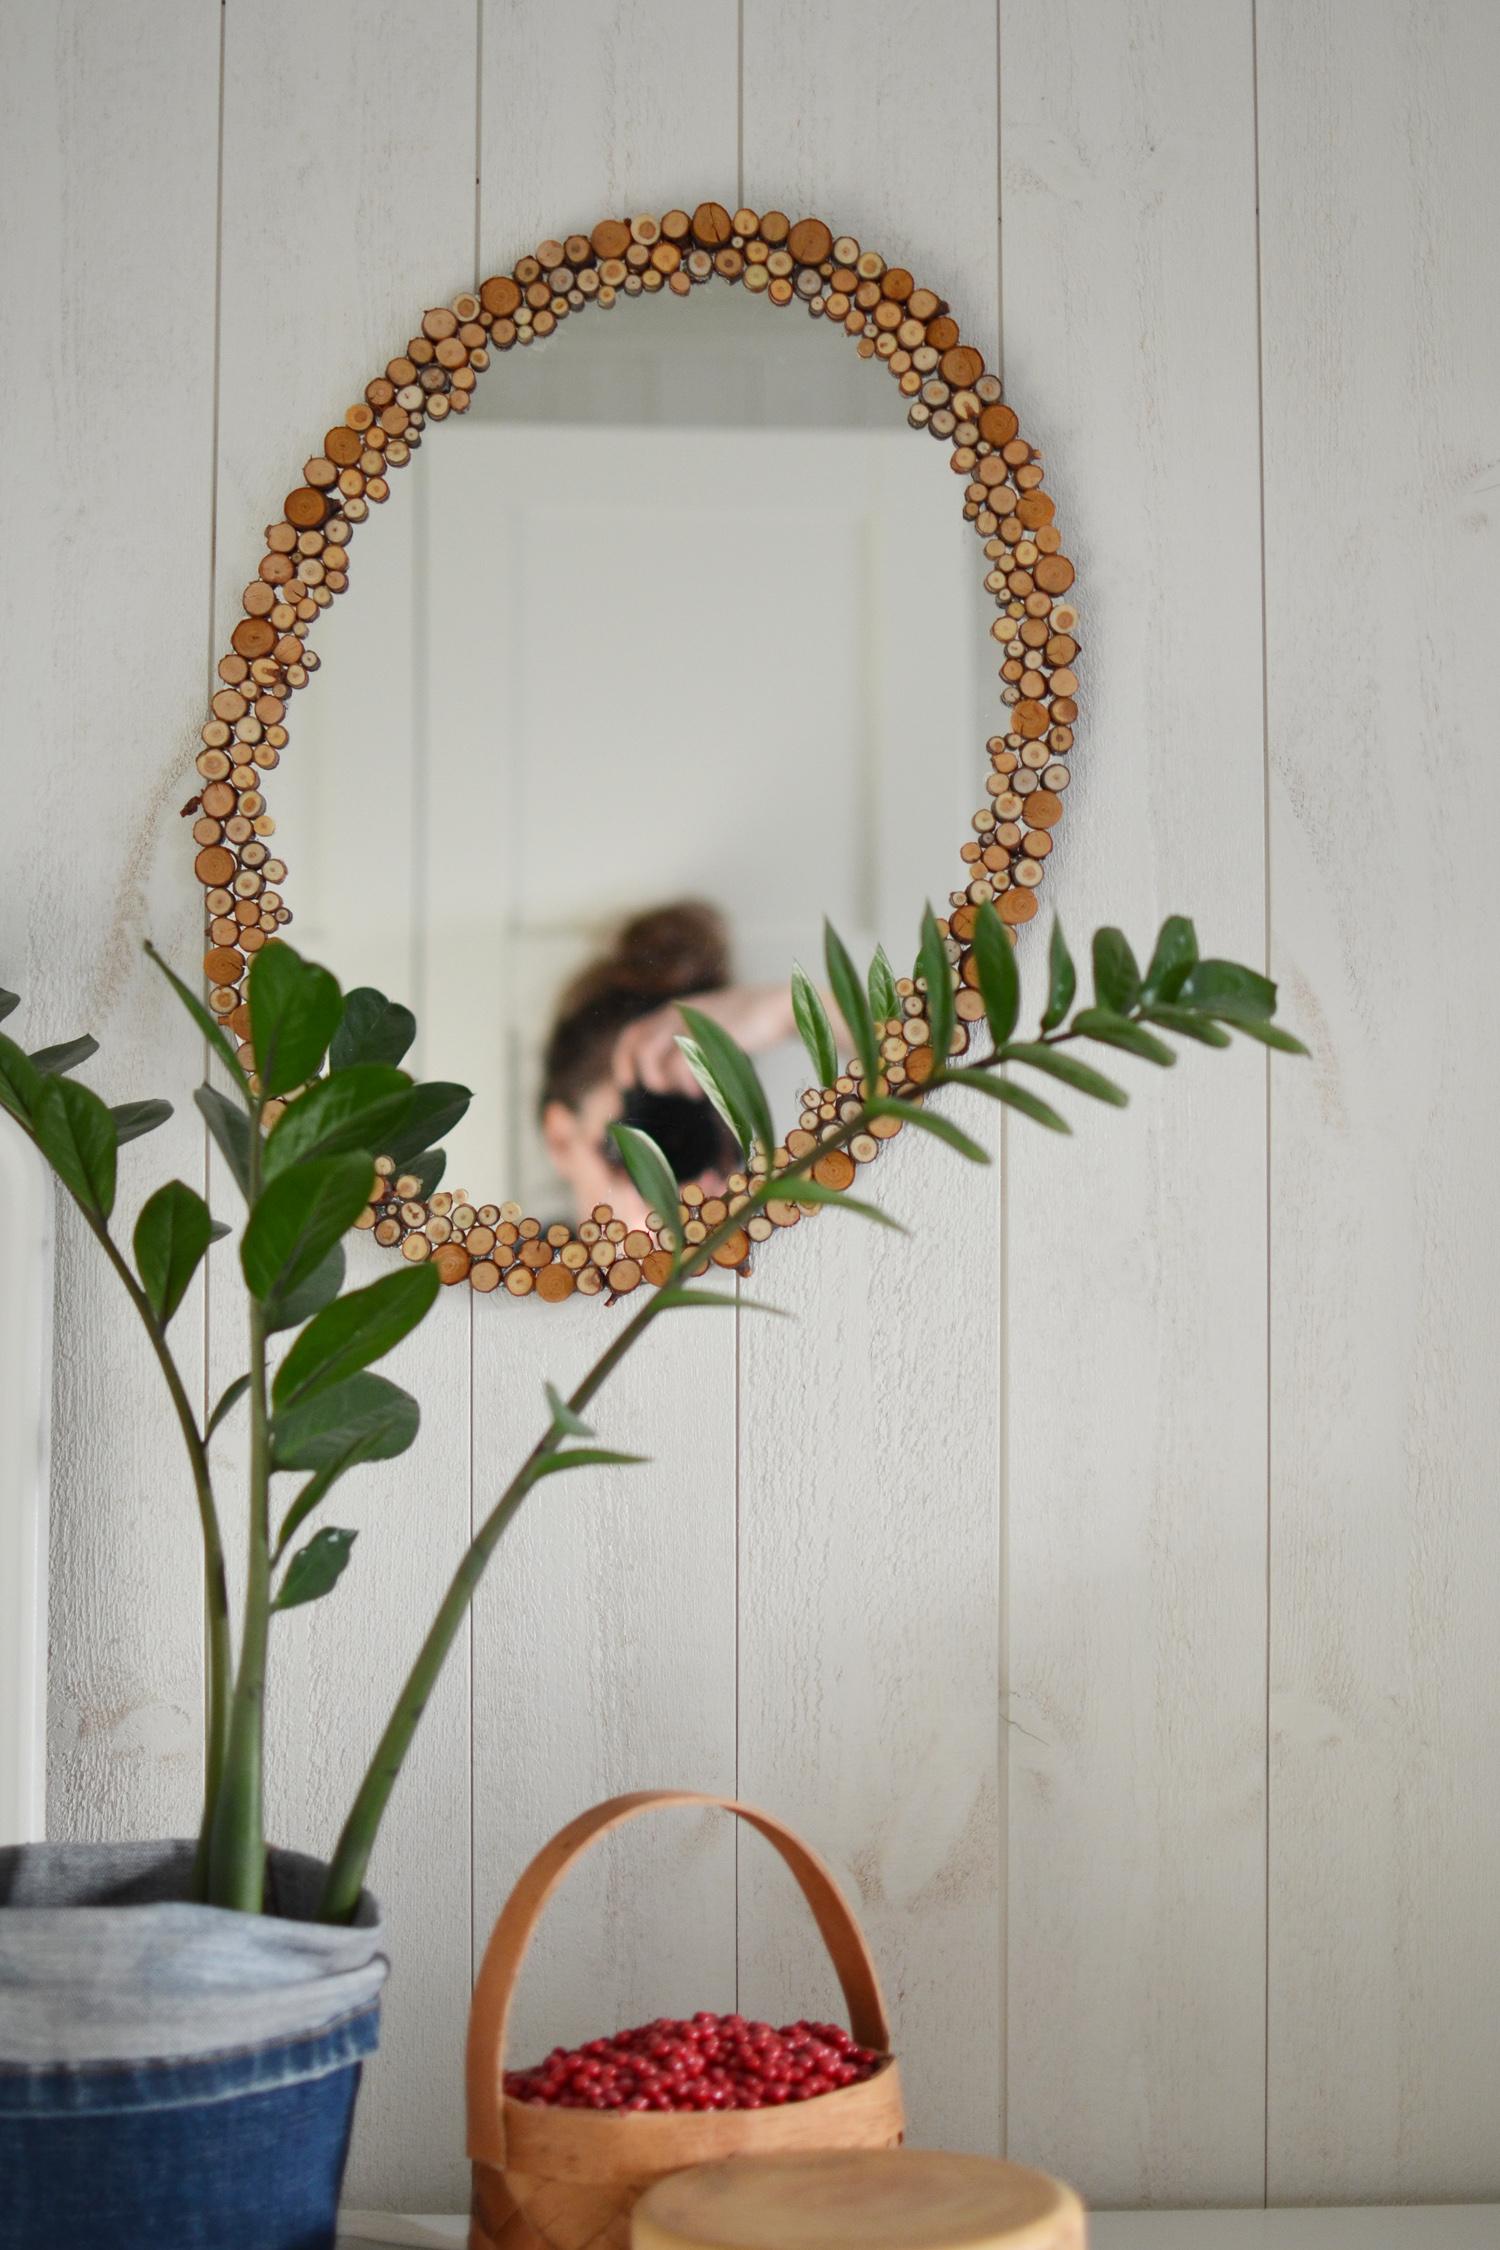 naturinspirerad spegelram